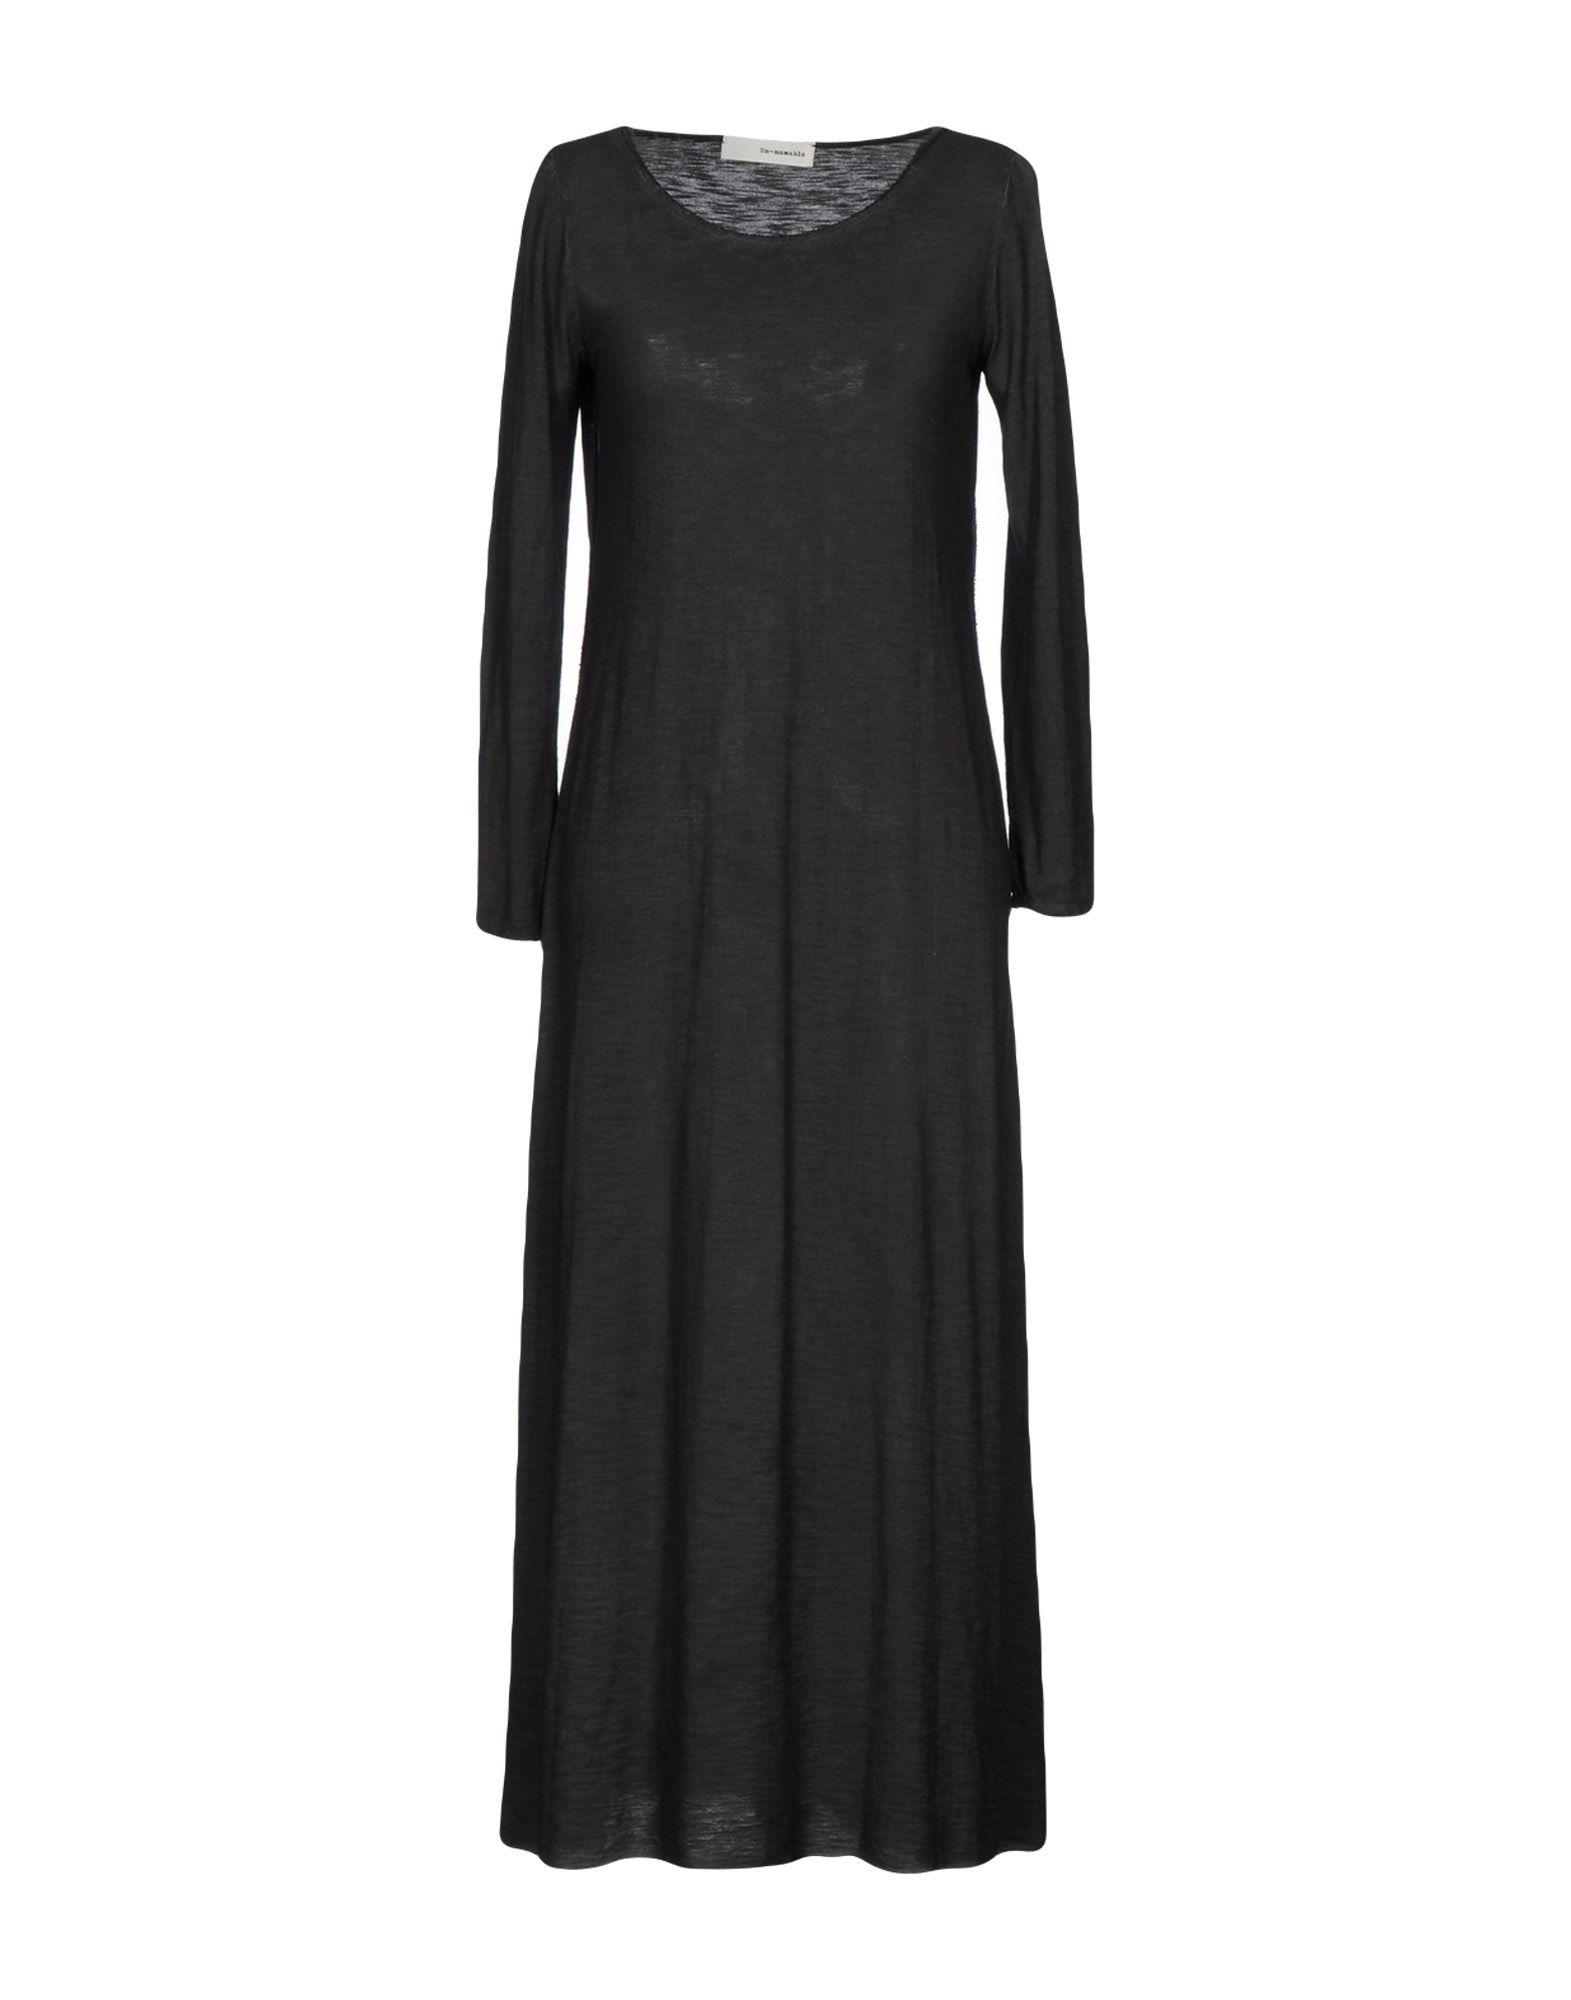 UN-NAMABLE Платье длиной 3/4 lisa corti платье длиной 3 4